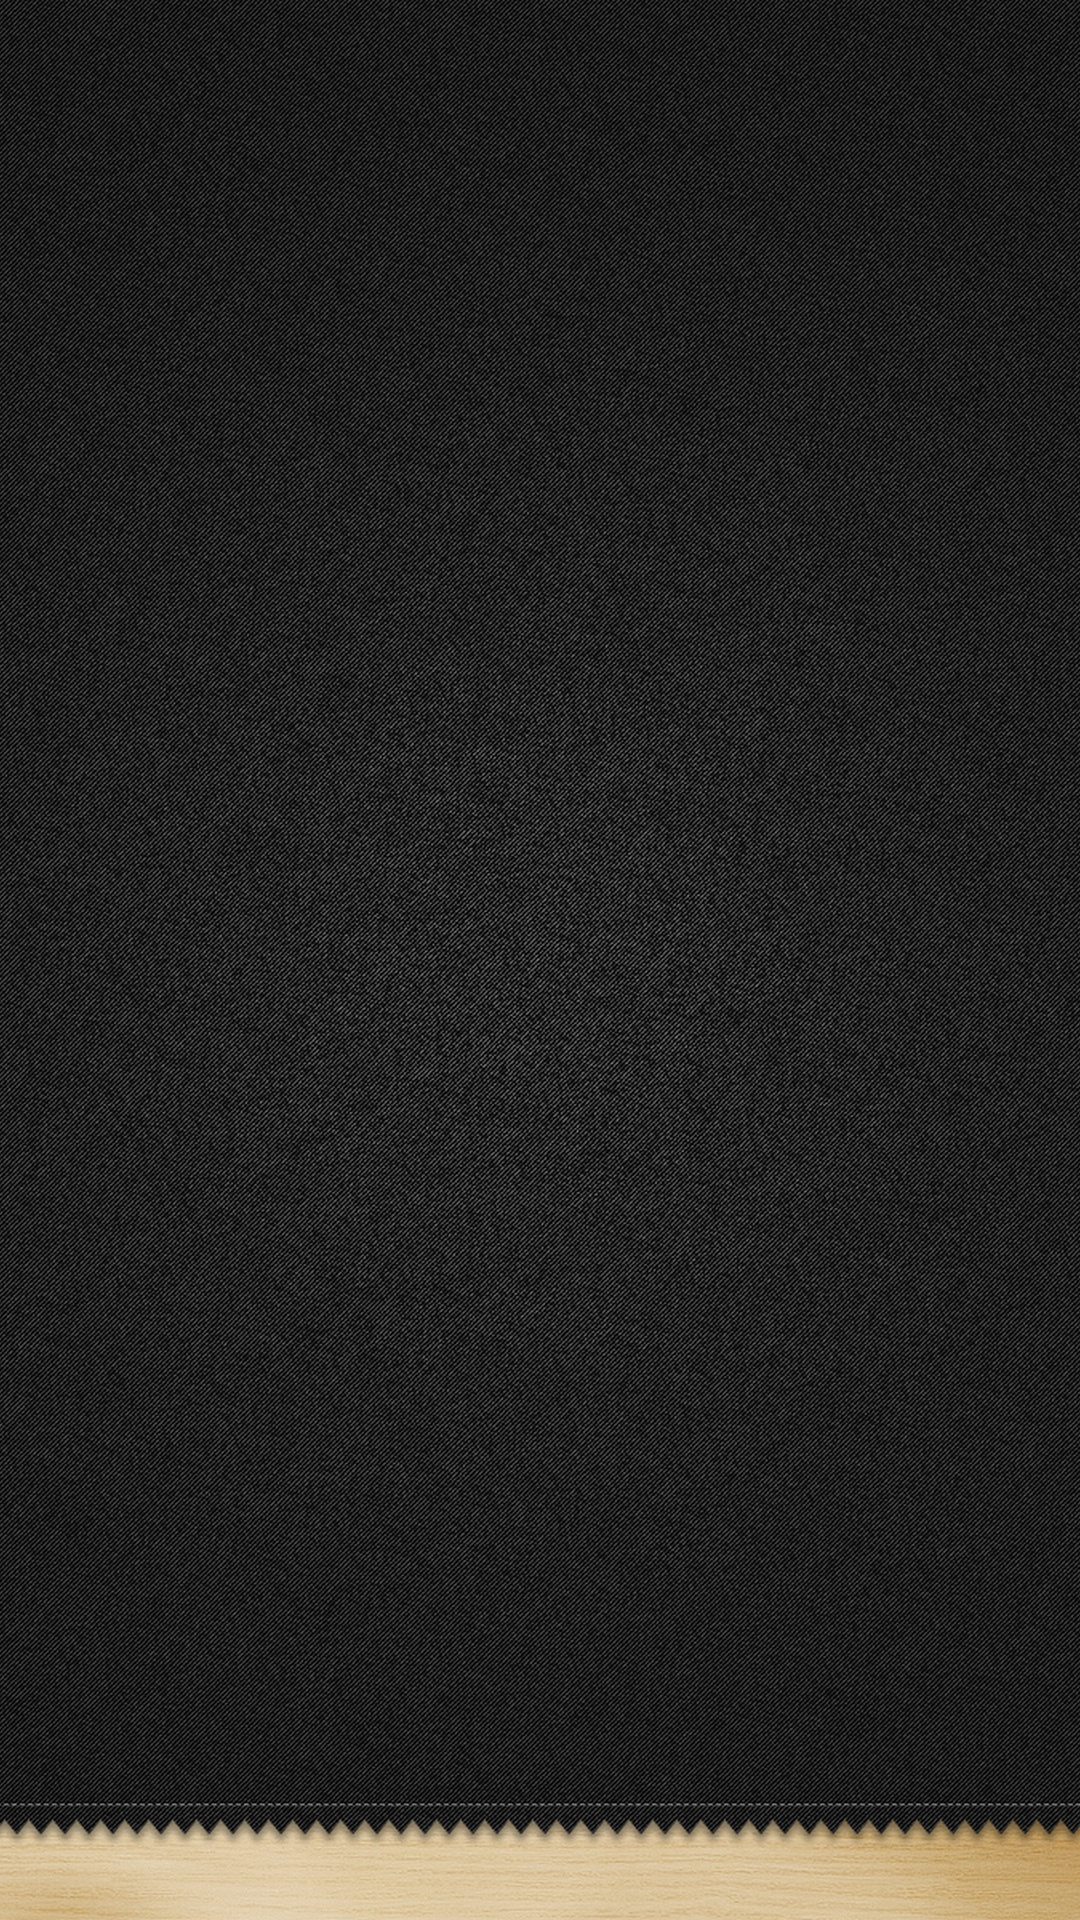 size 1080x1920 tags black jeans fabric pattern download black jeans 1080x1920